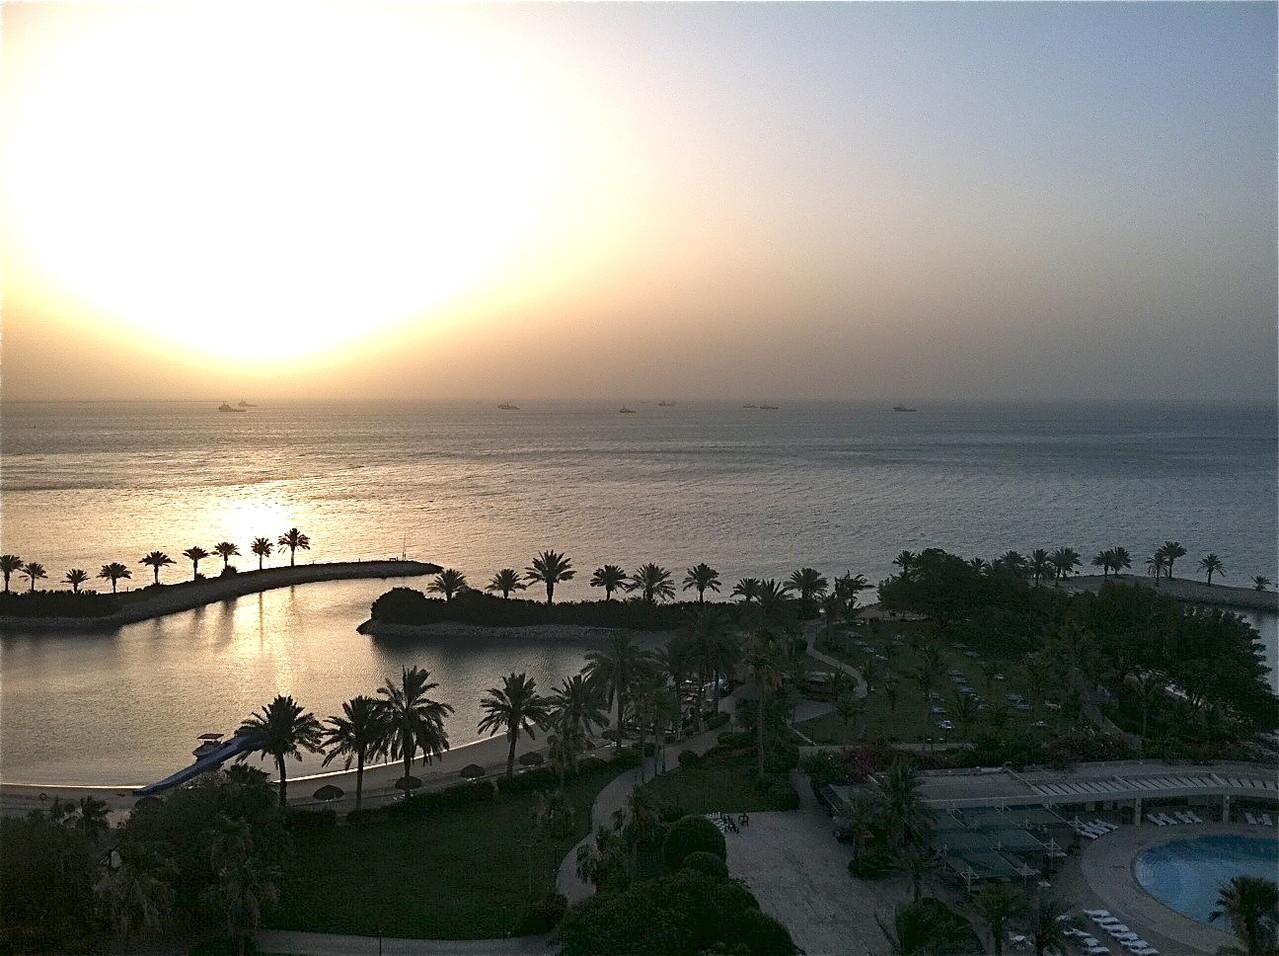 sunrise, sandstorm, Sheraton Doha, Qatar